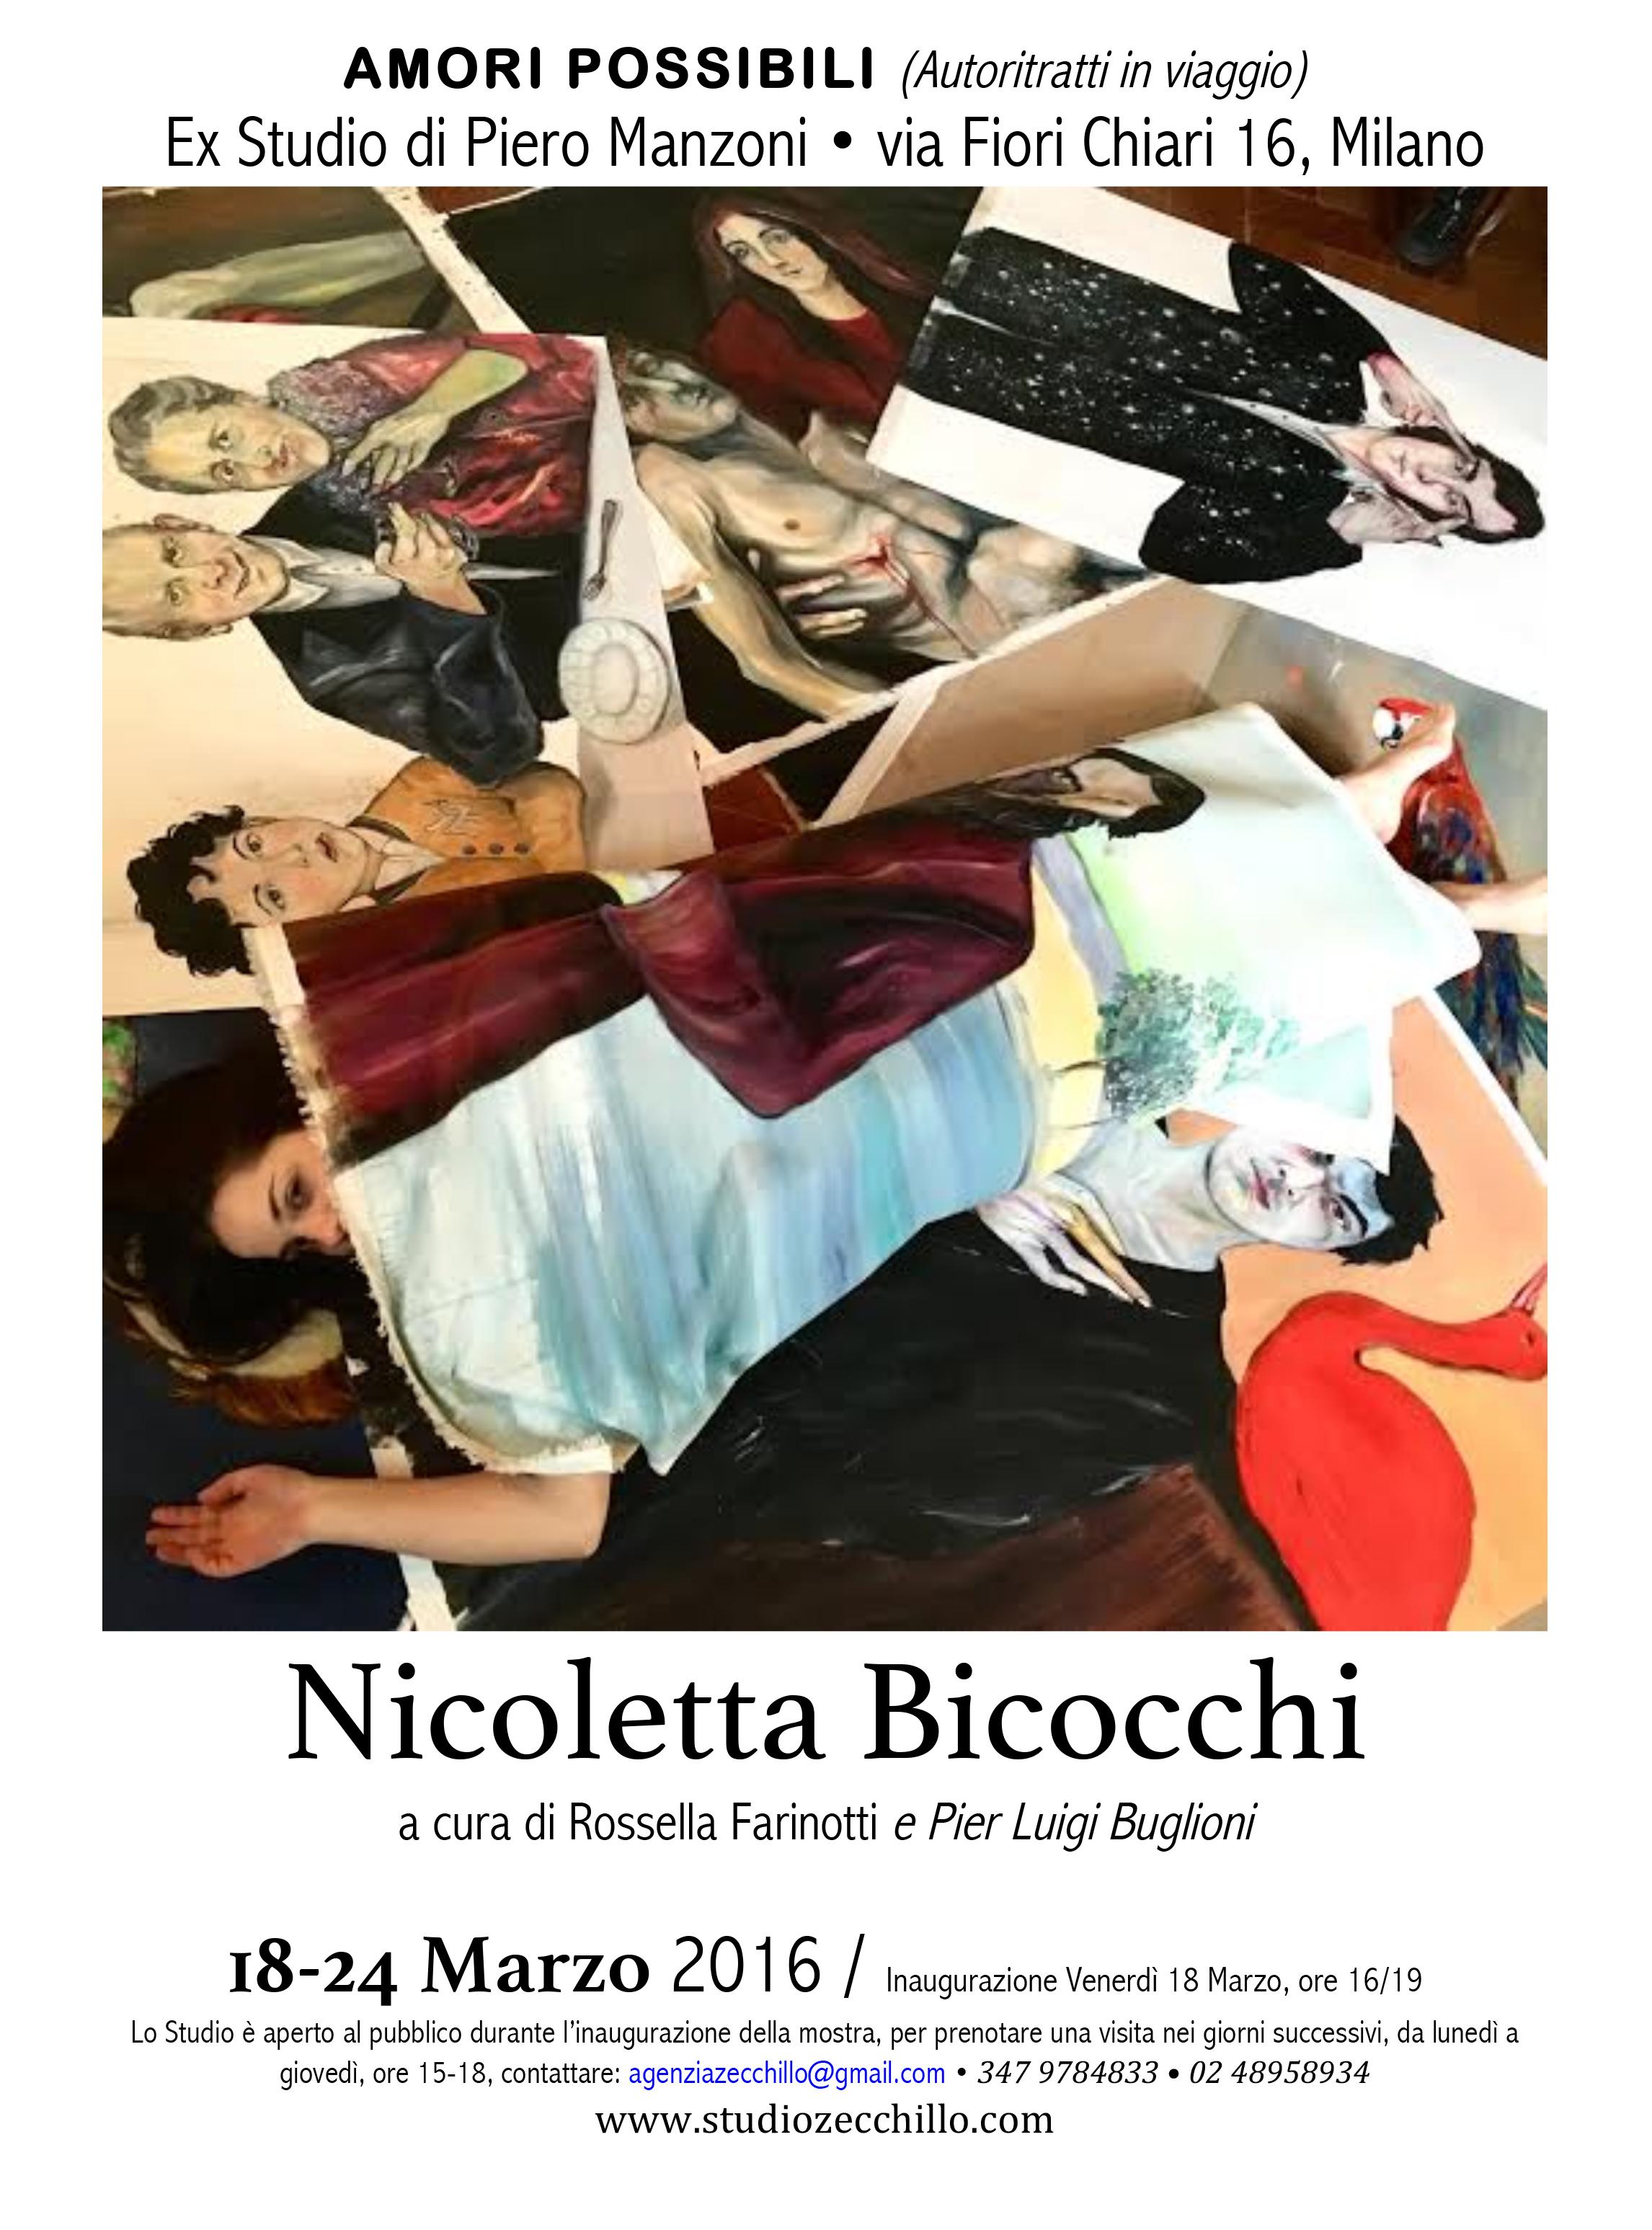 Microsoft Word - AMORI POSSIBILI_Nicoletta.doc